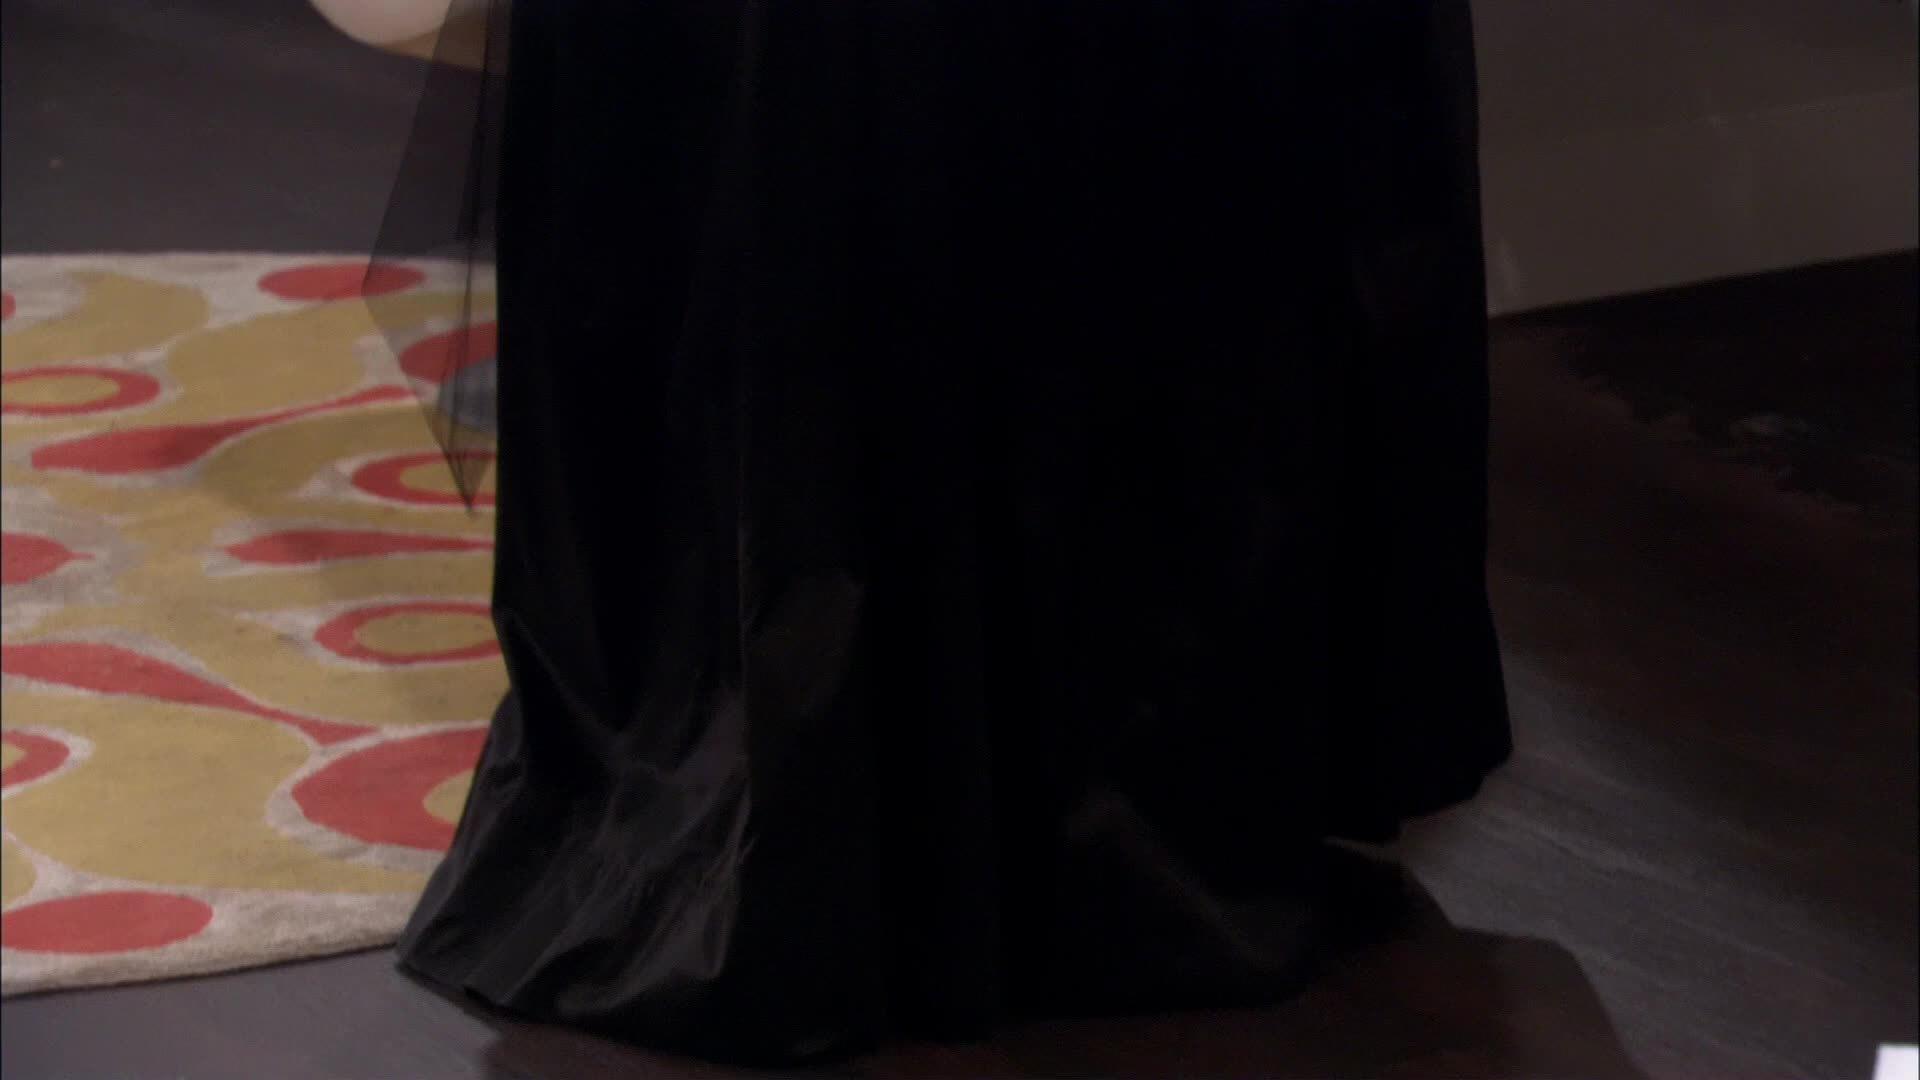 Kat Dennings, KatDennings, gentlemanbonersgifs, Kat Dennings (reddit) GIFs